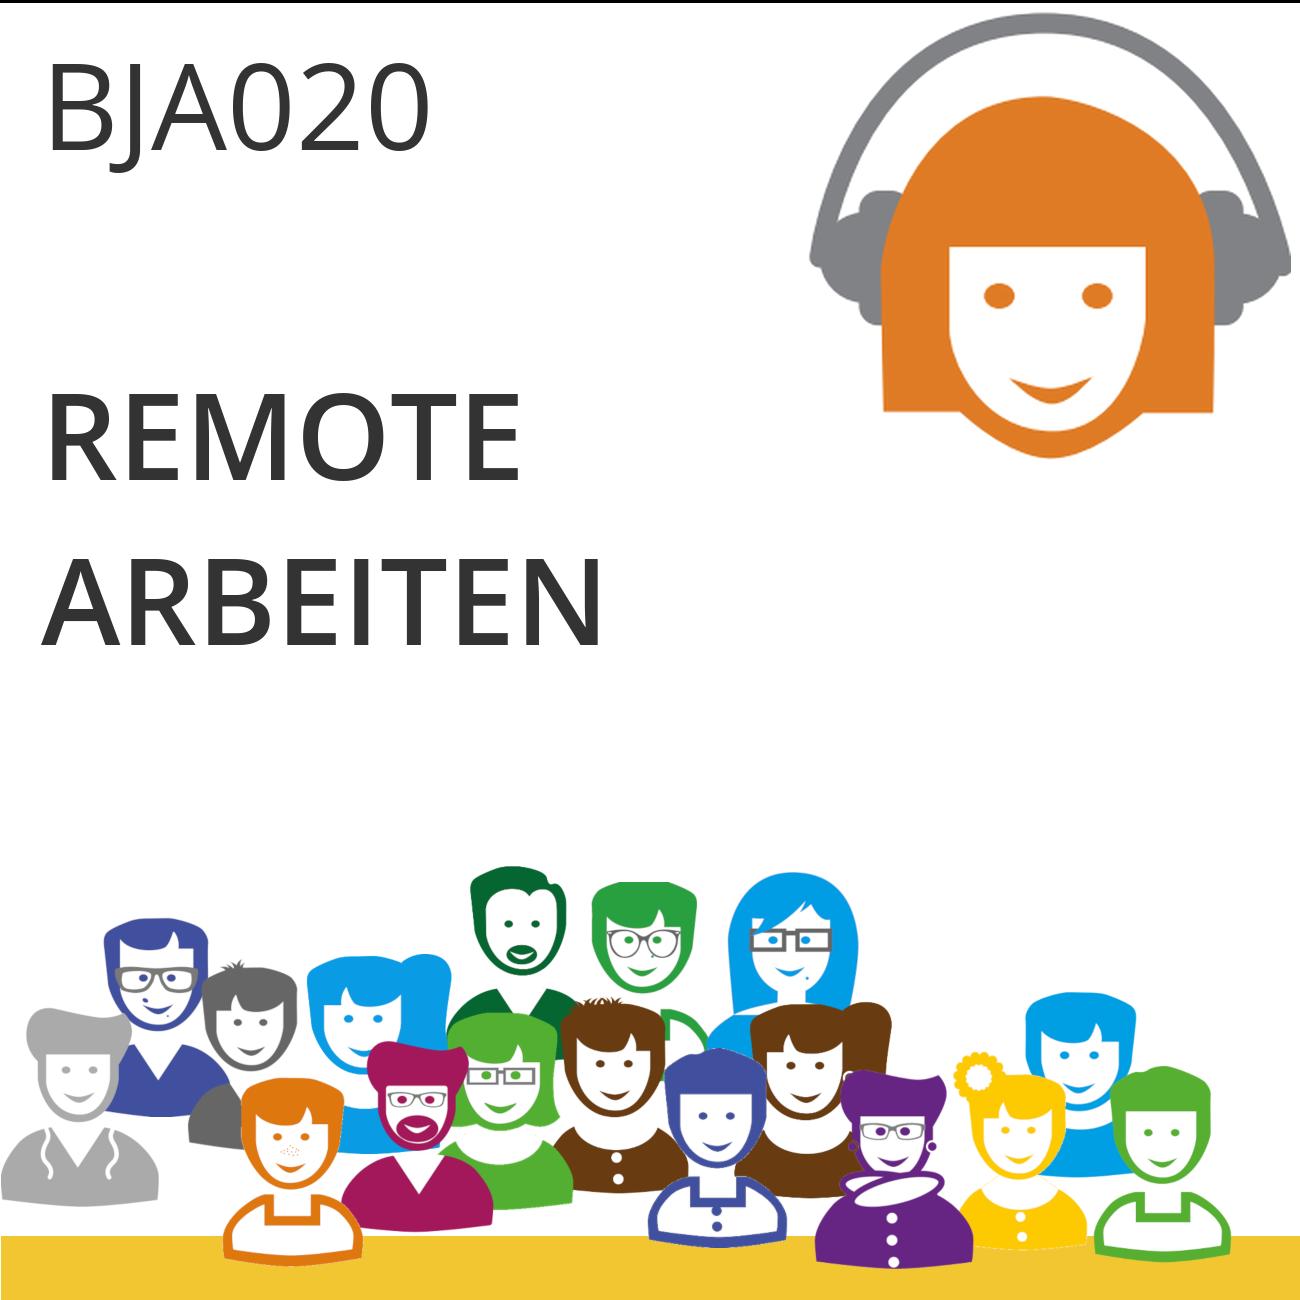 BJA020 | Remote arbeiten